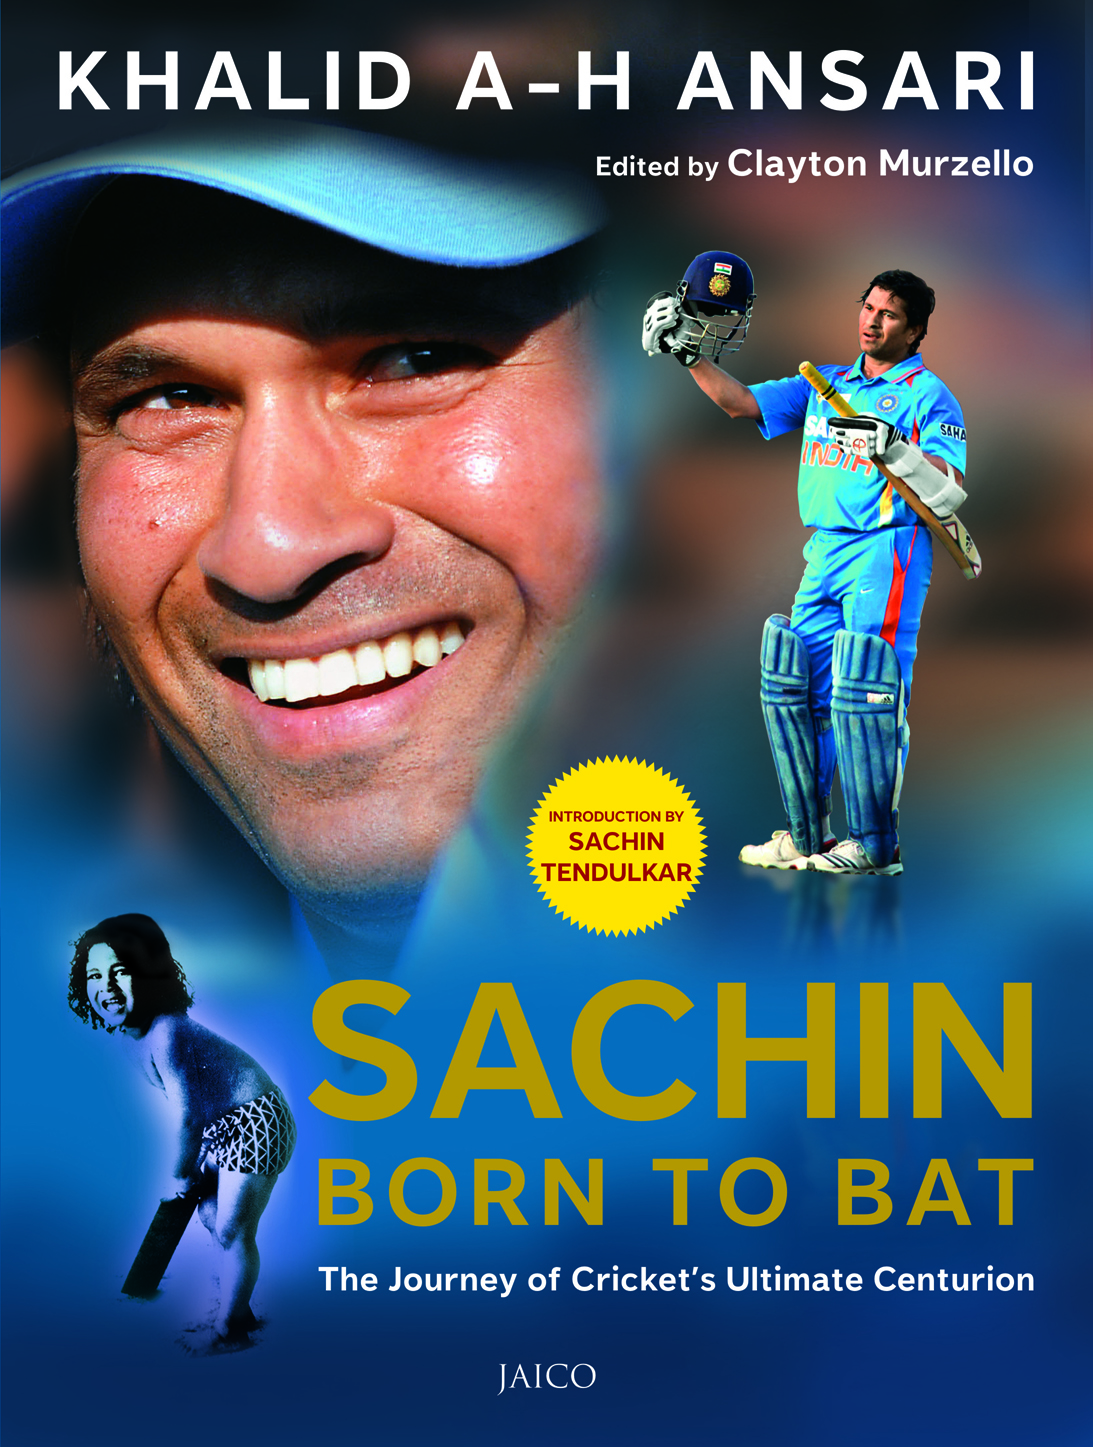 Sachin Tendulkar Autobiography Book